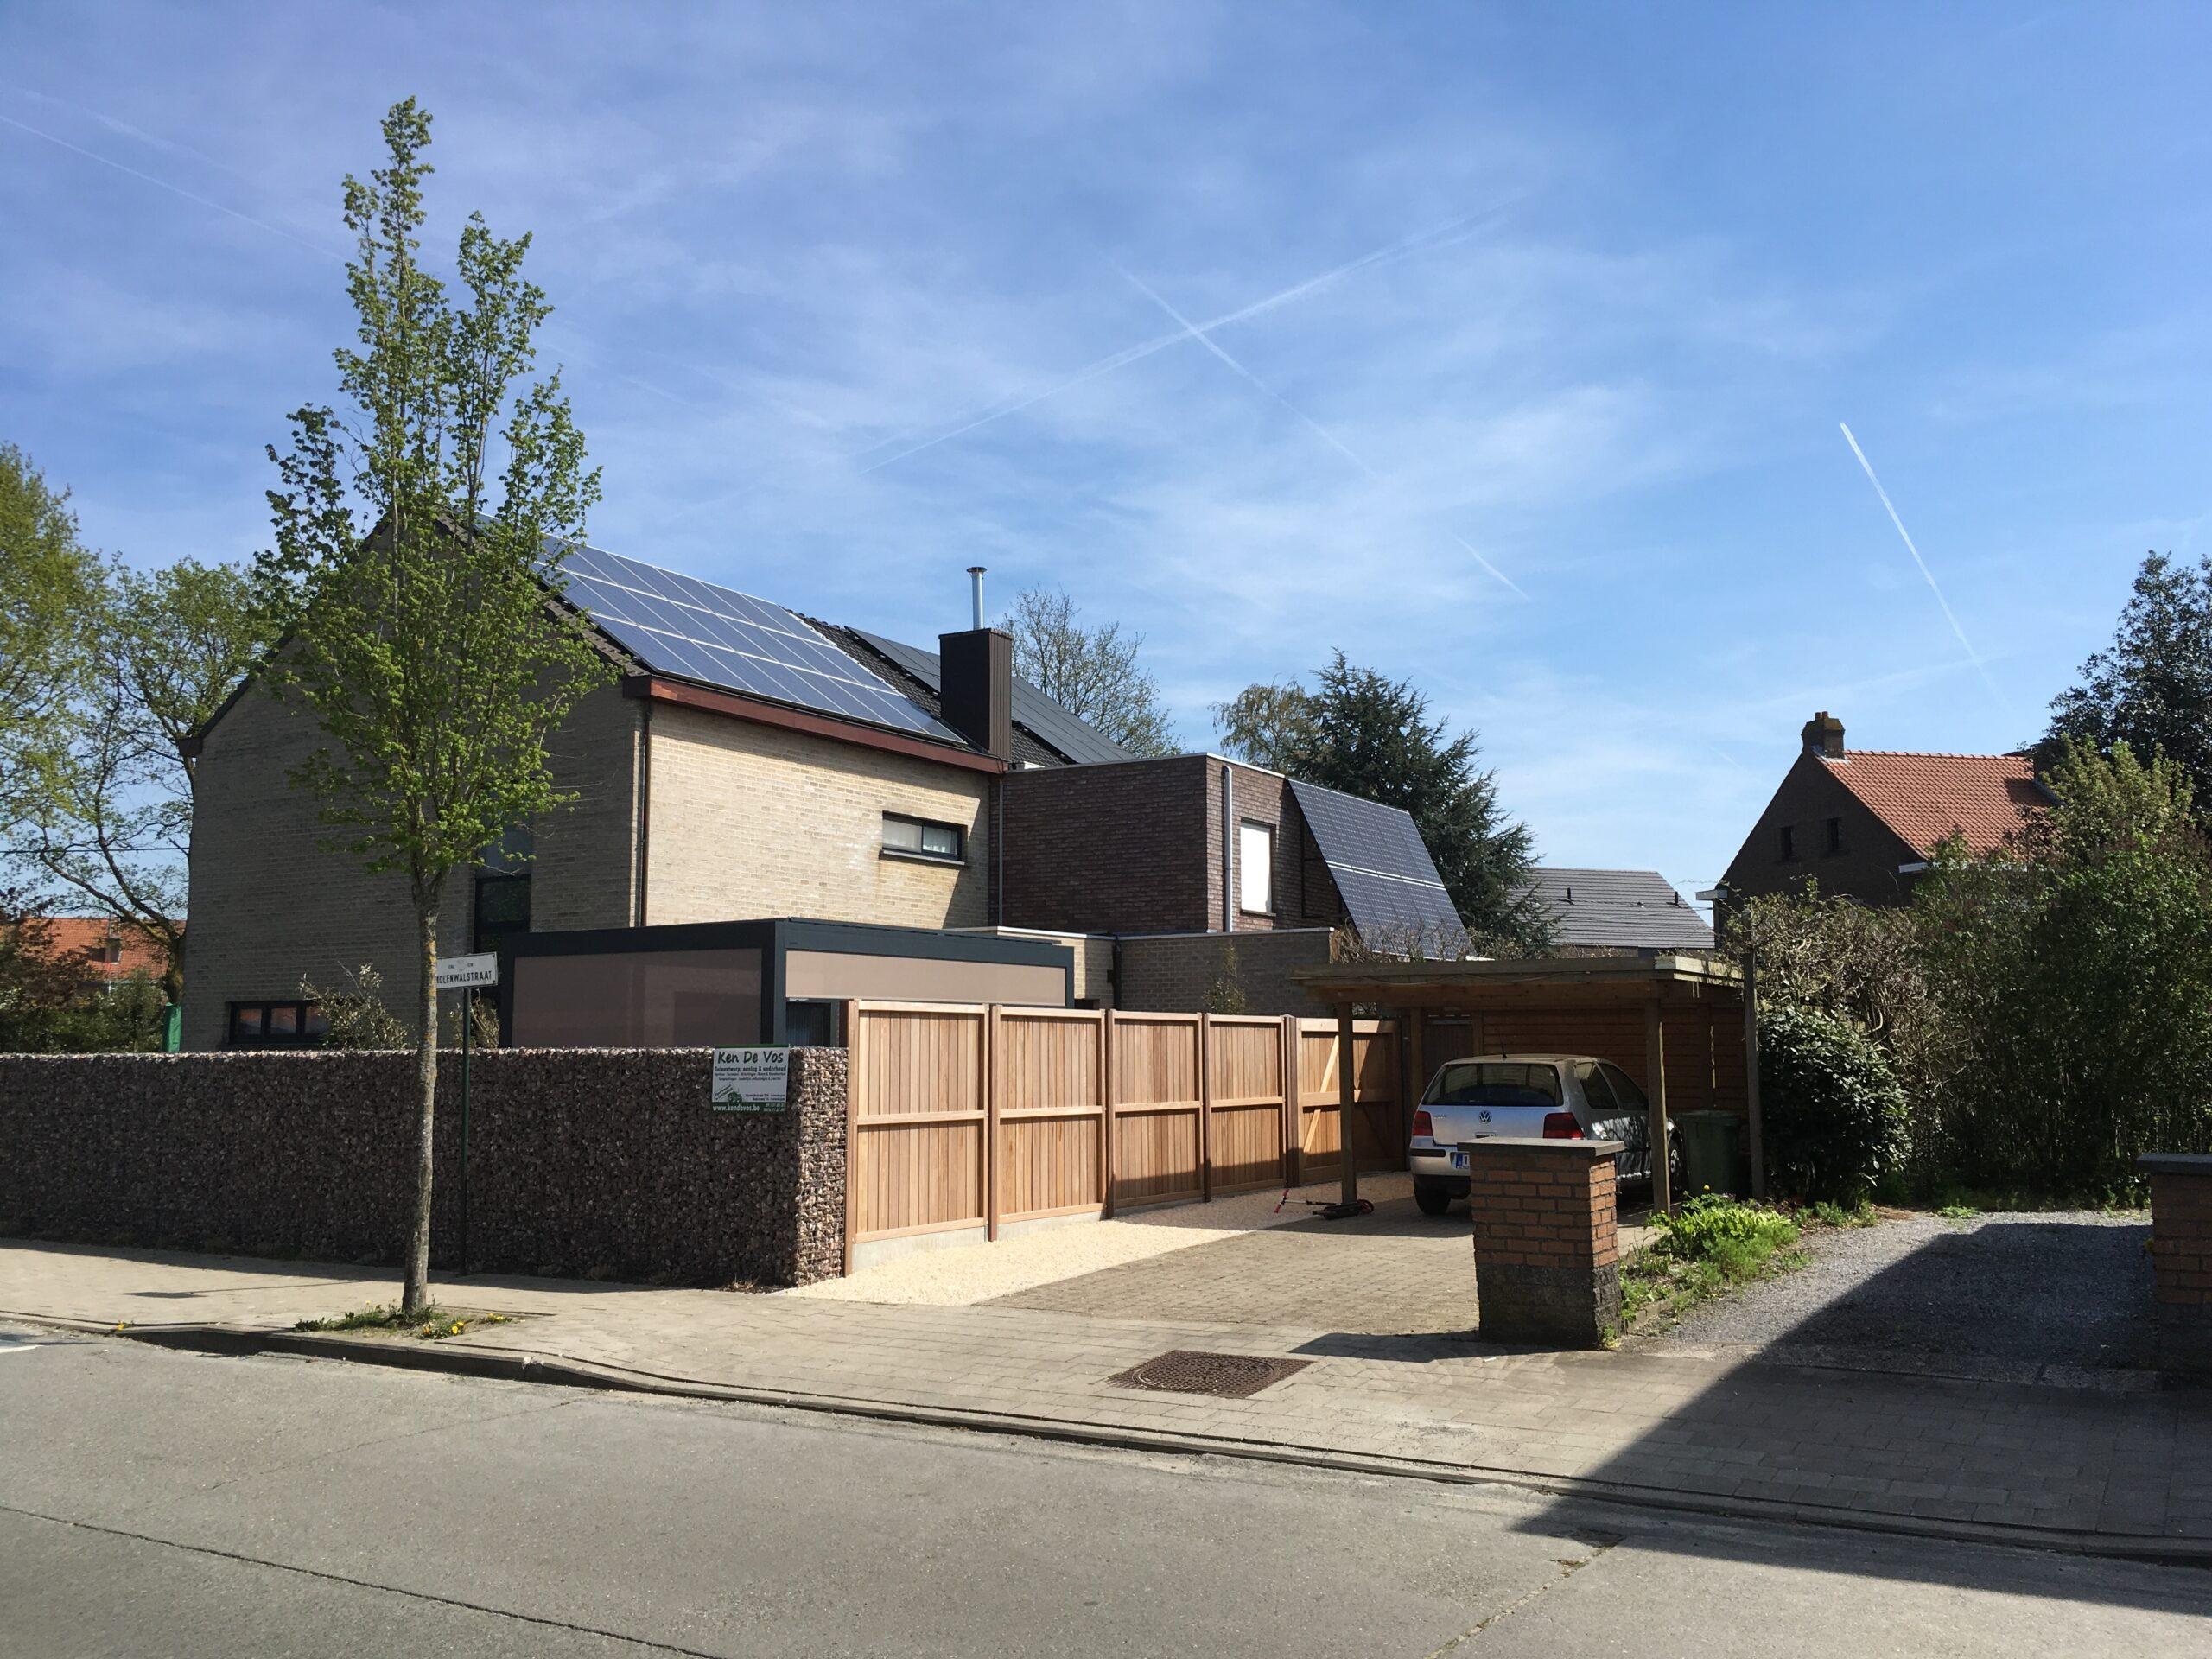 Warmtepomp en zonnepanelen 3